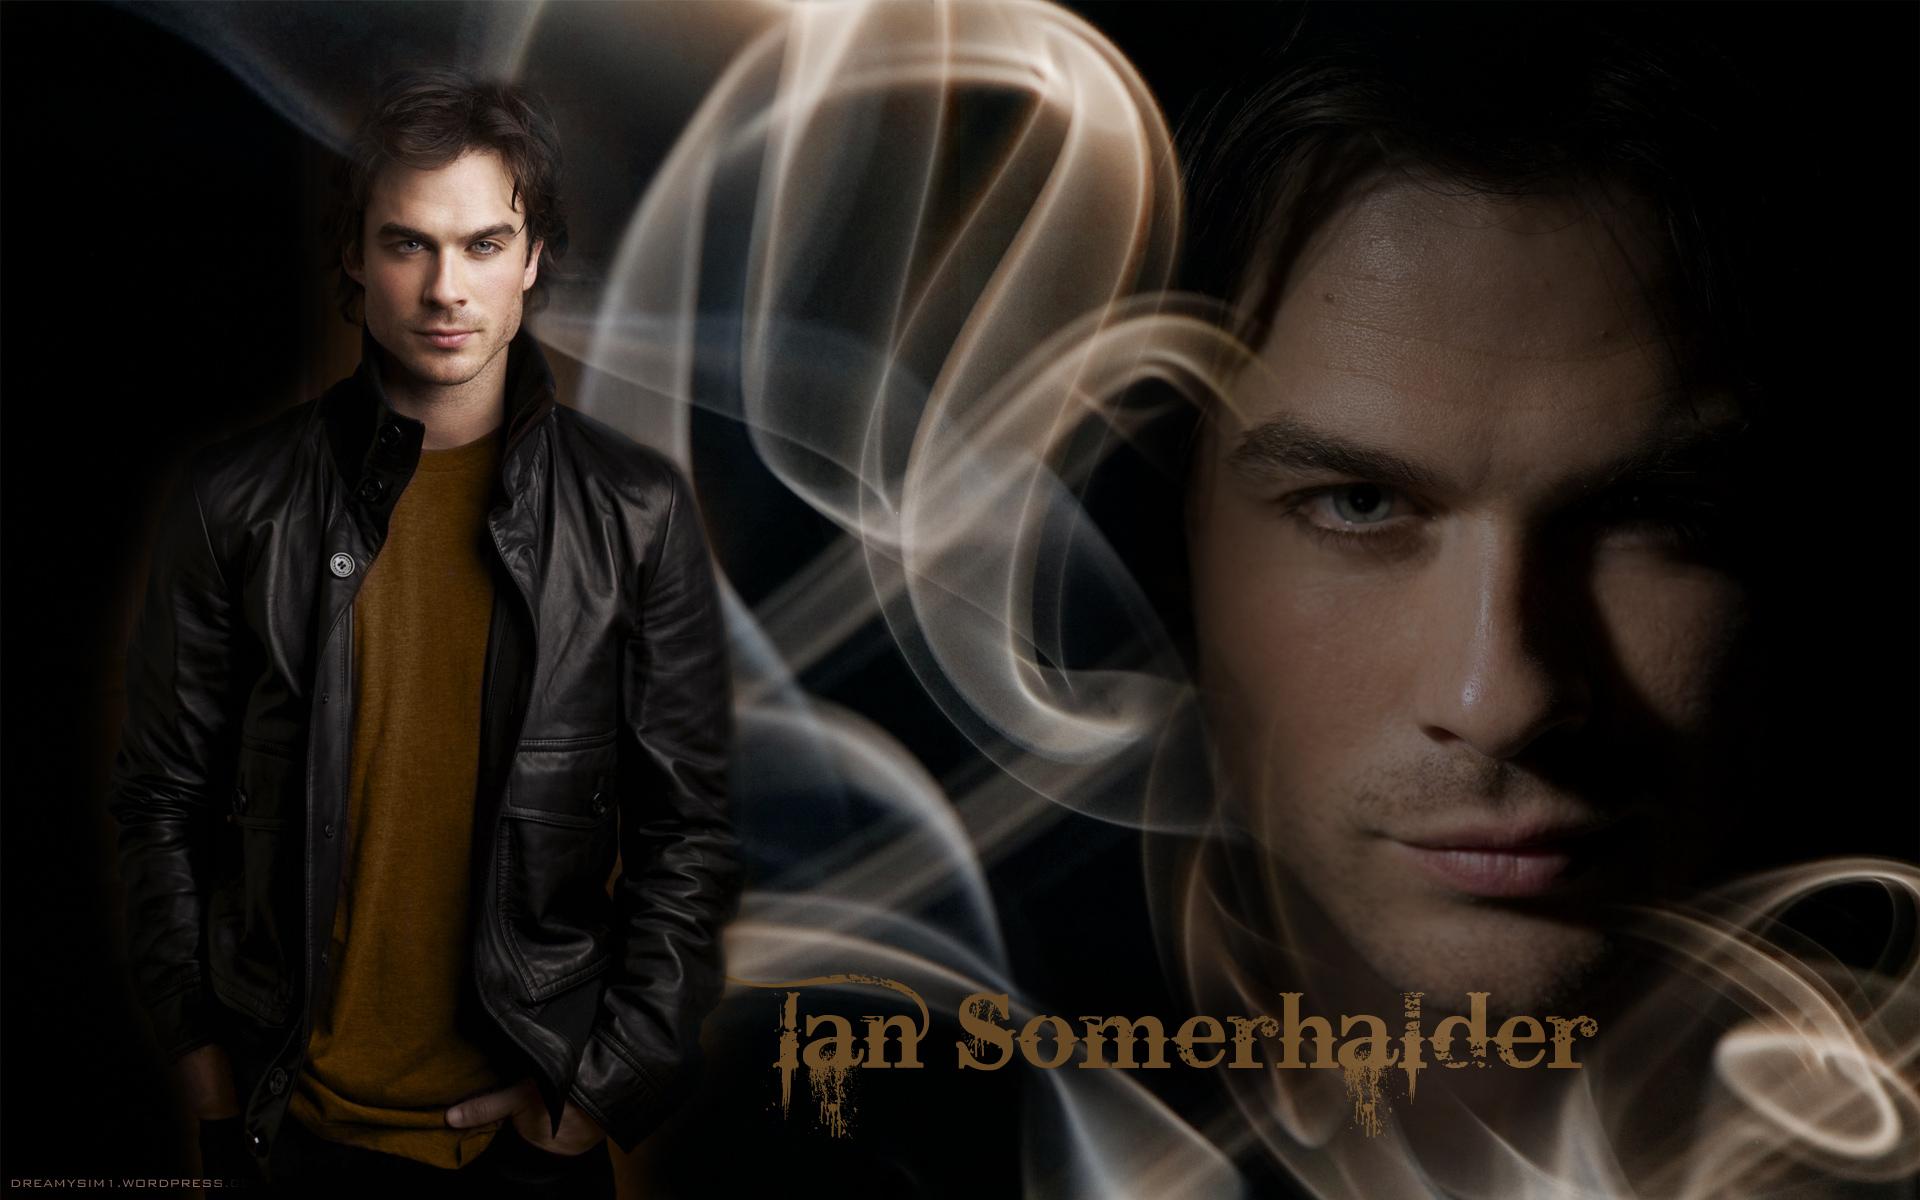 Vampire Diaries Salvatore Brothers Wallpaper 840x525